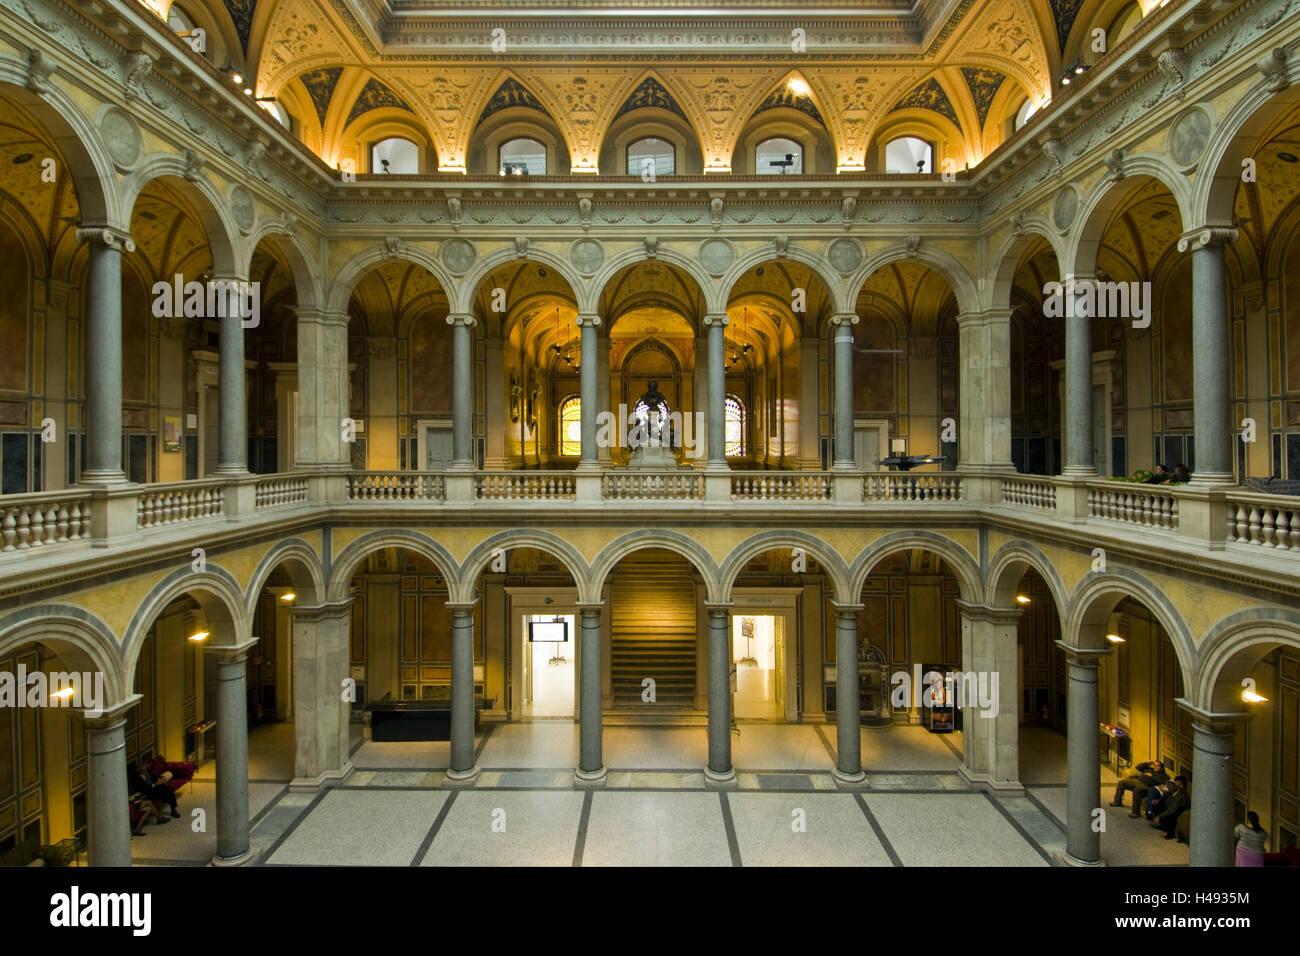 Austria Vienna Room Ring 5 Mak Austrian Museum Applied Arts The Stock Photo Alamy